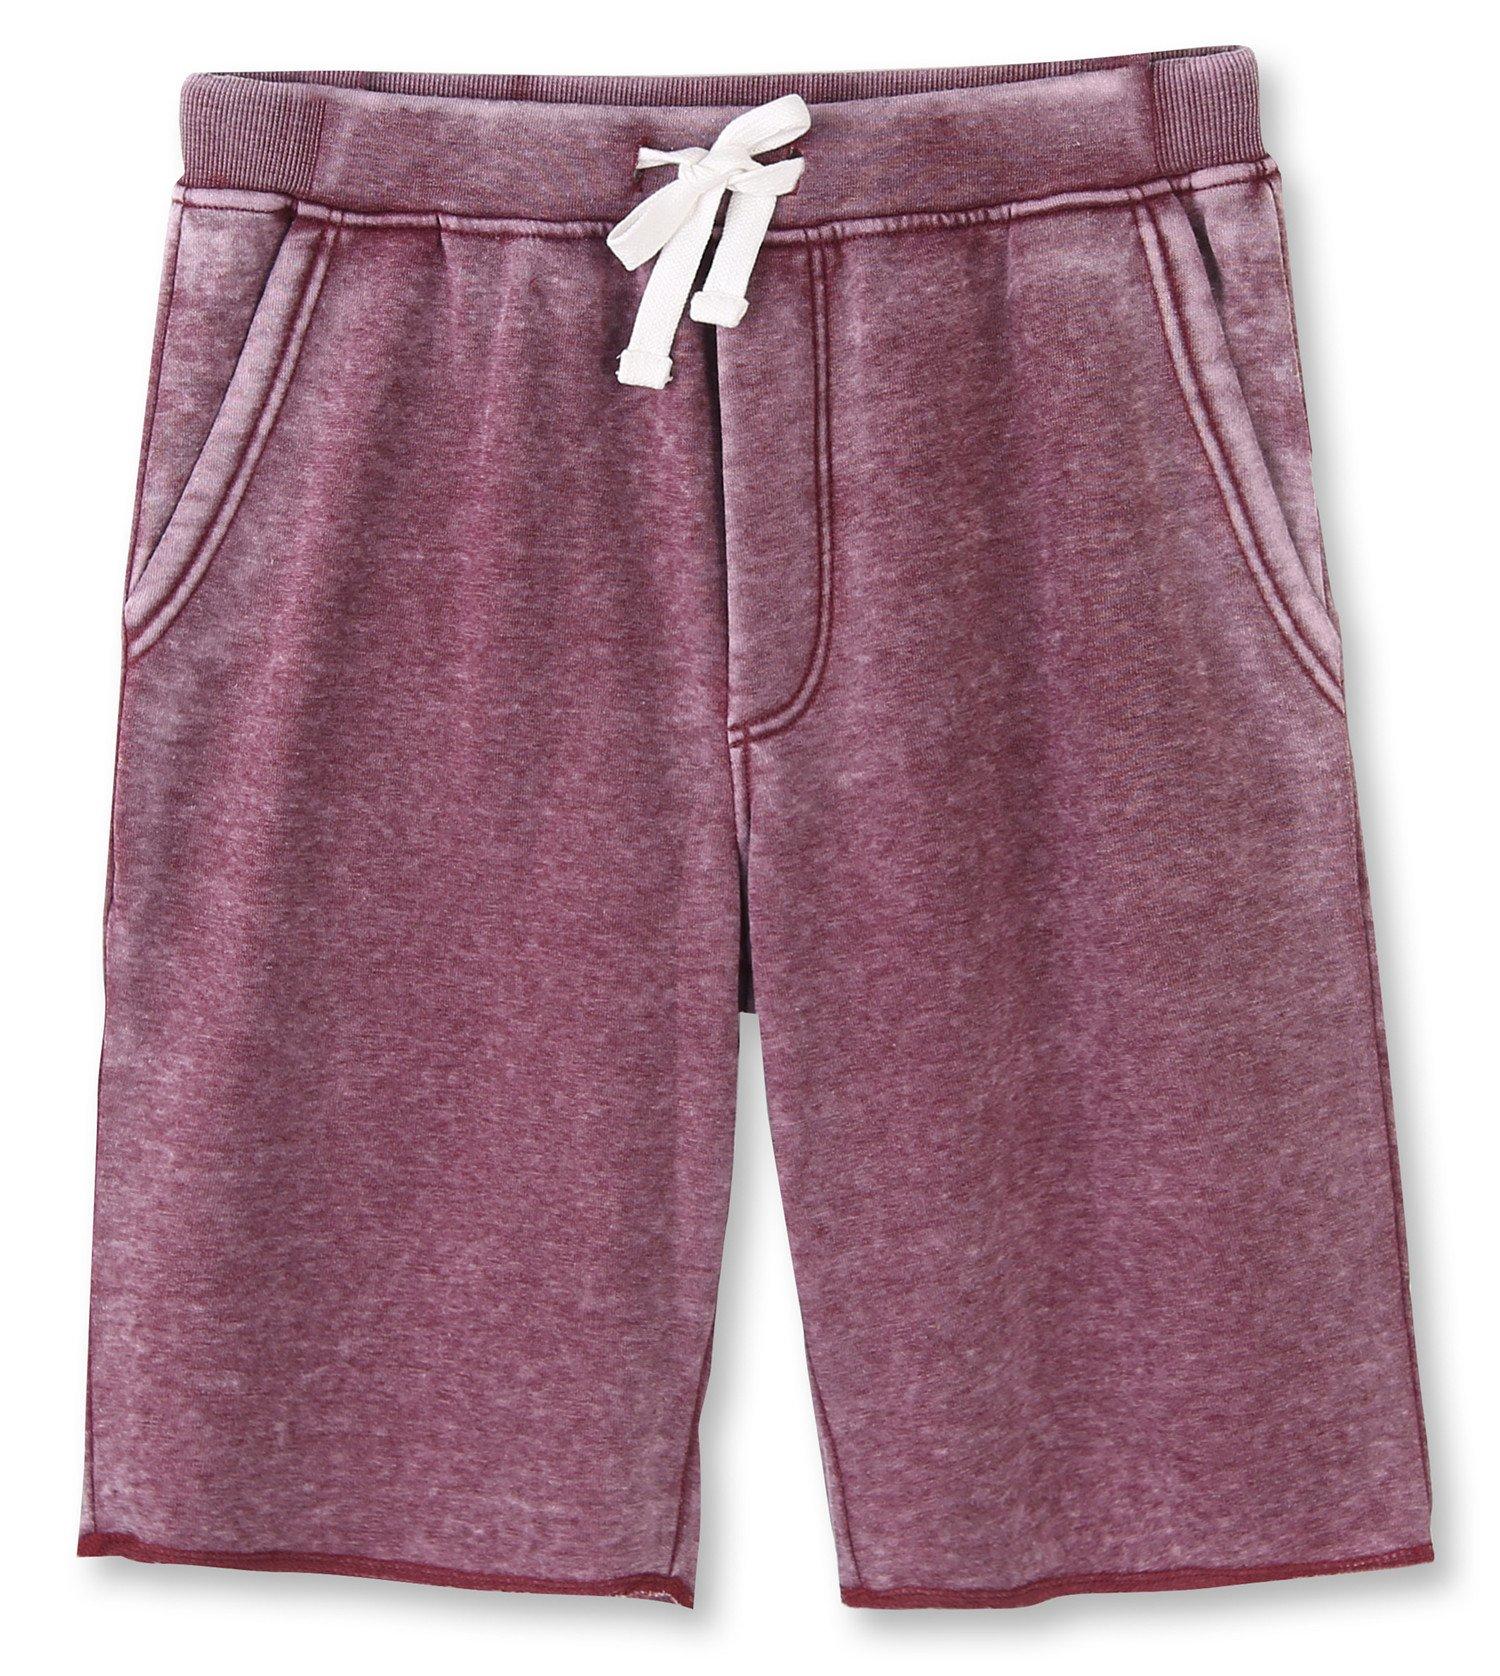 HETHCODE Men's Casual Classic Fit Cotton Elastic Fleece Jogger Gym Shorts Burnout Wine L